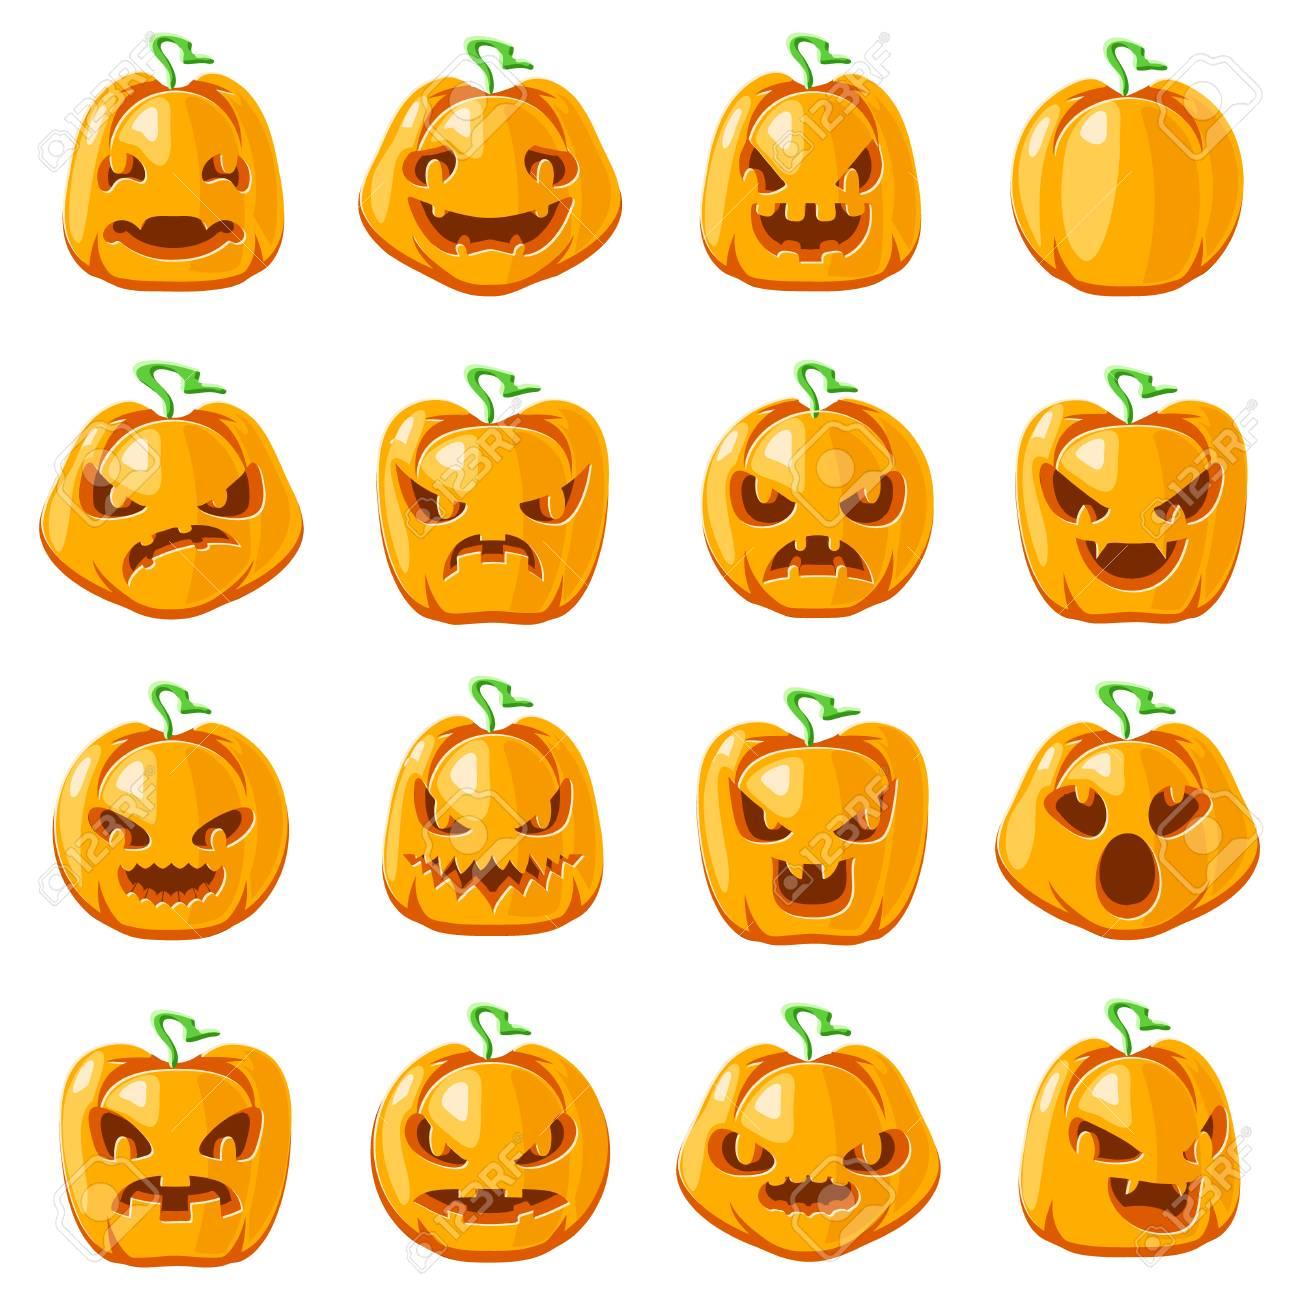 decoration halloween jack o lantern pumpkin scary faces smile rh 123rf com scary pumpkin faces carving pumpkin scary faces ideas